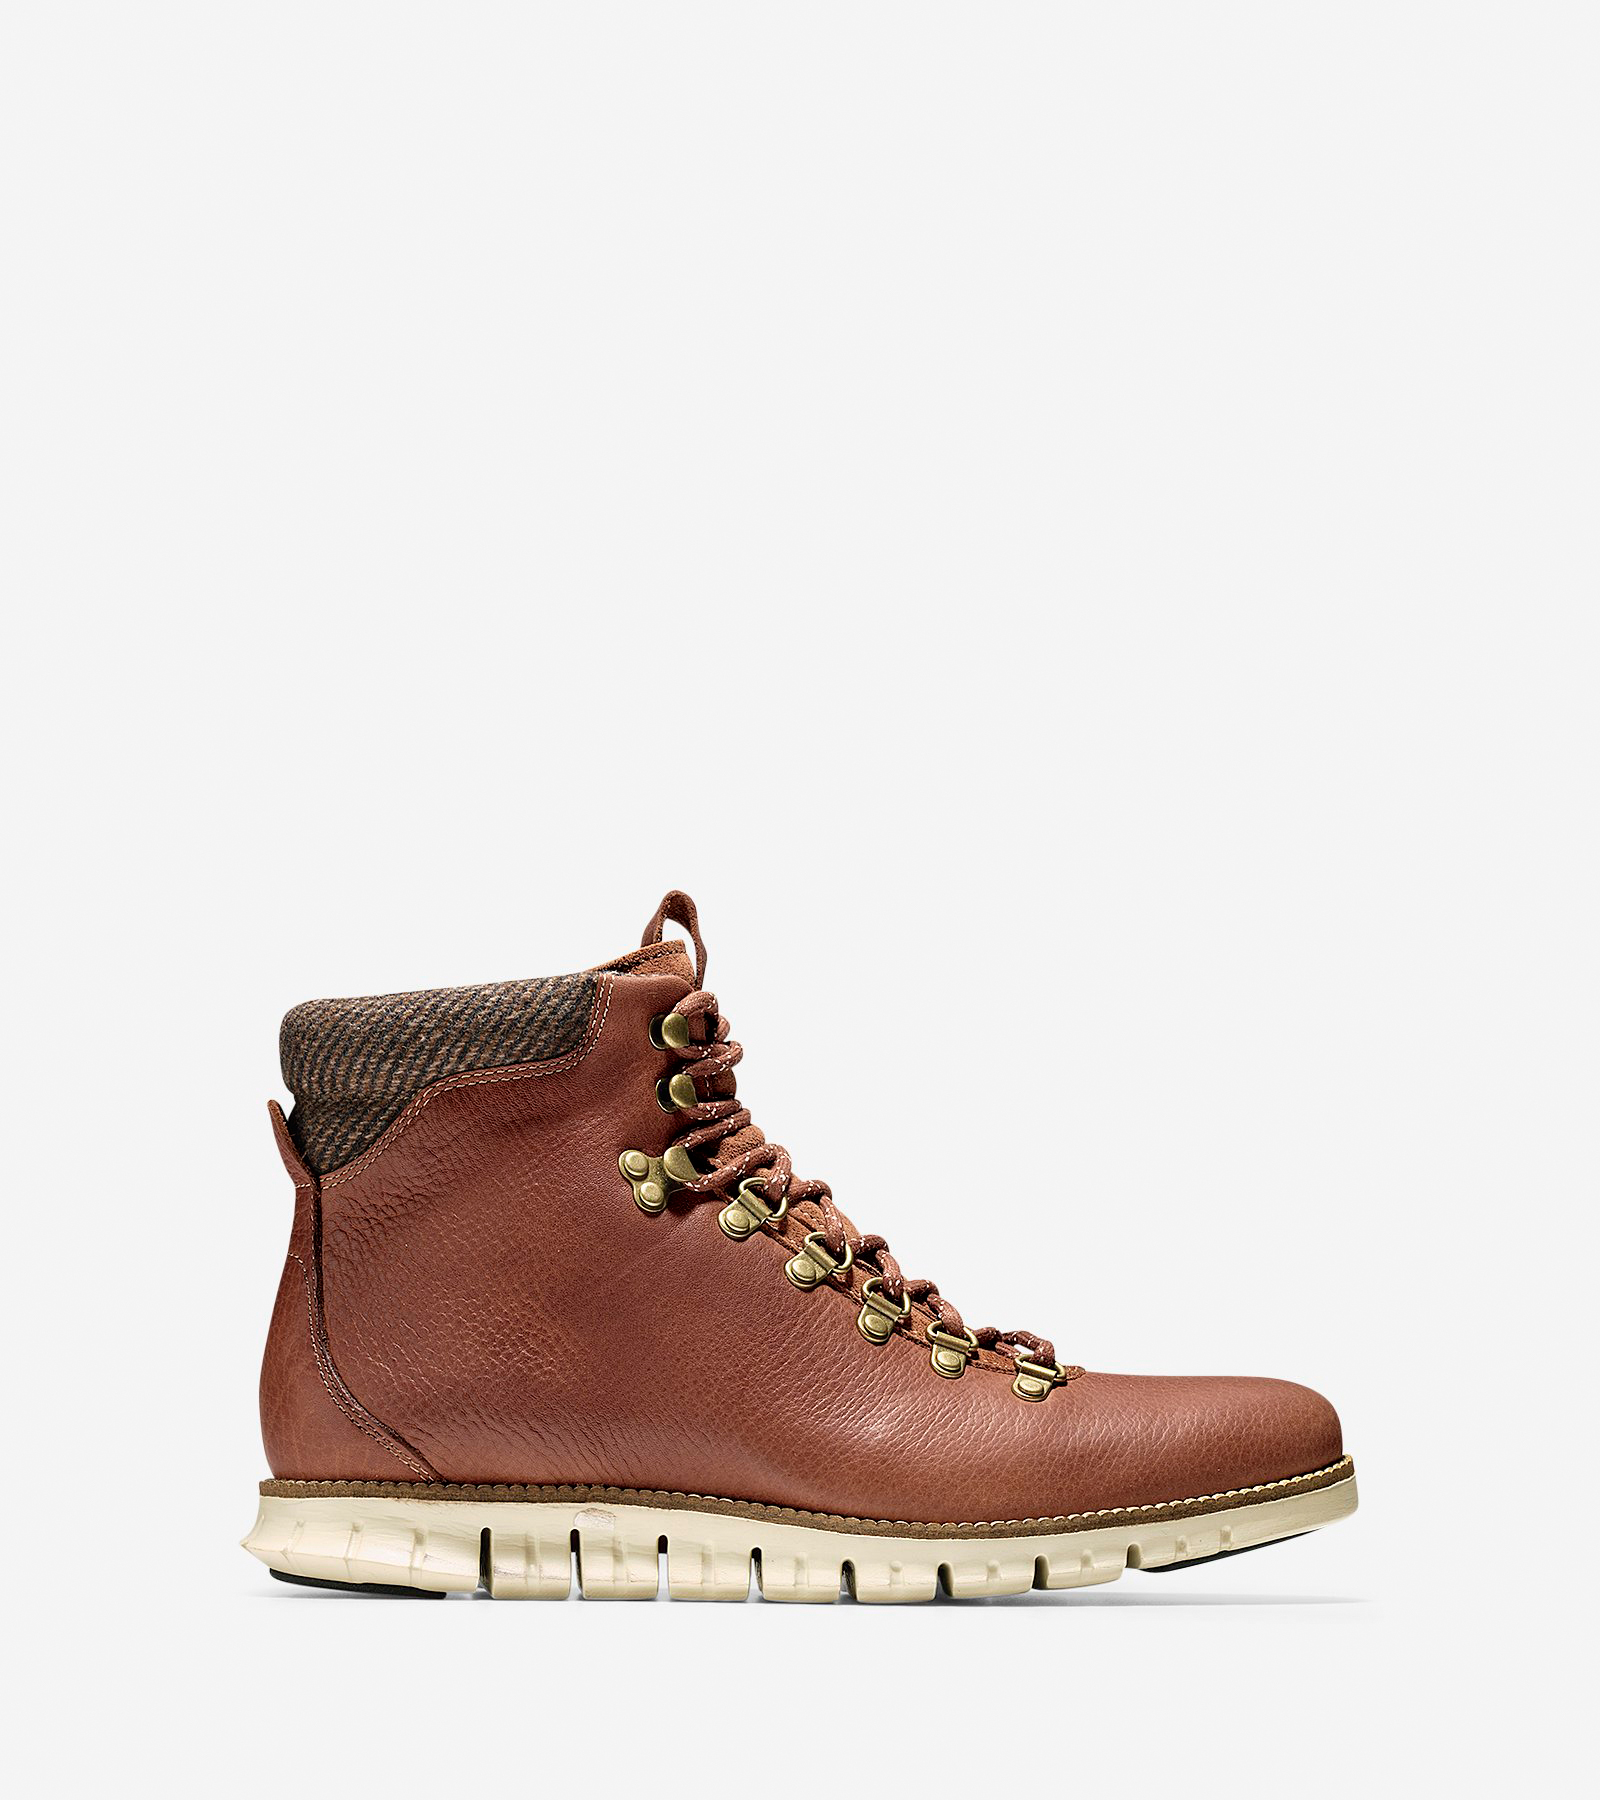 1b0e5960133 ZERØGRAND Hiker Boot